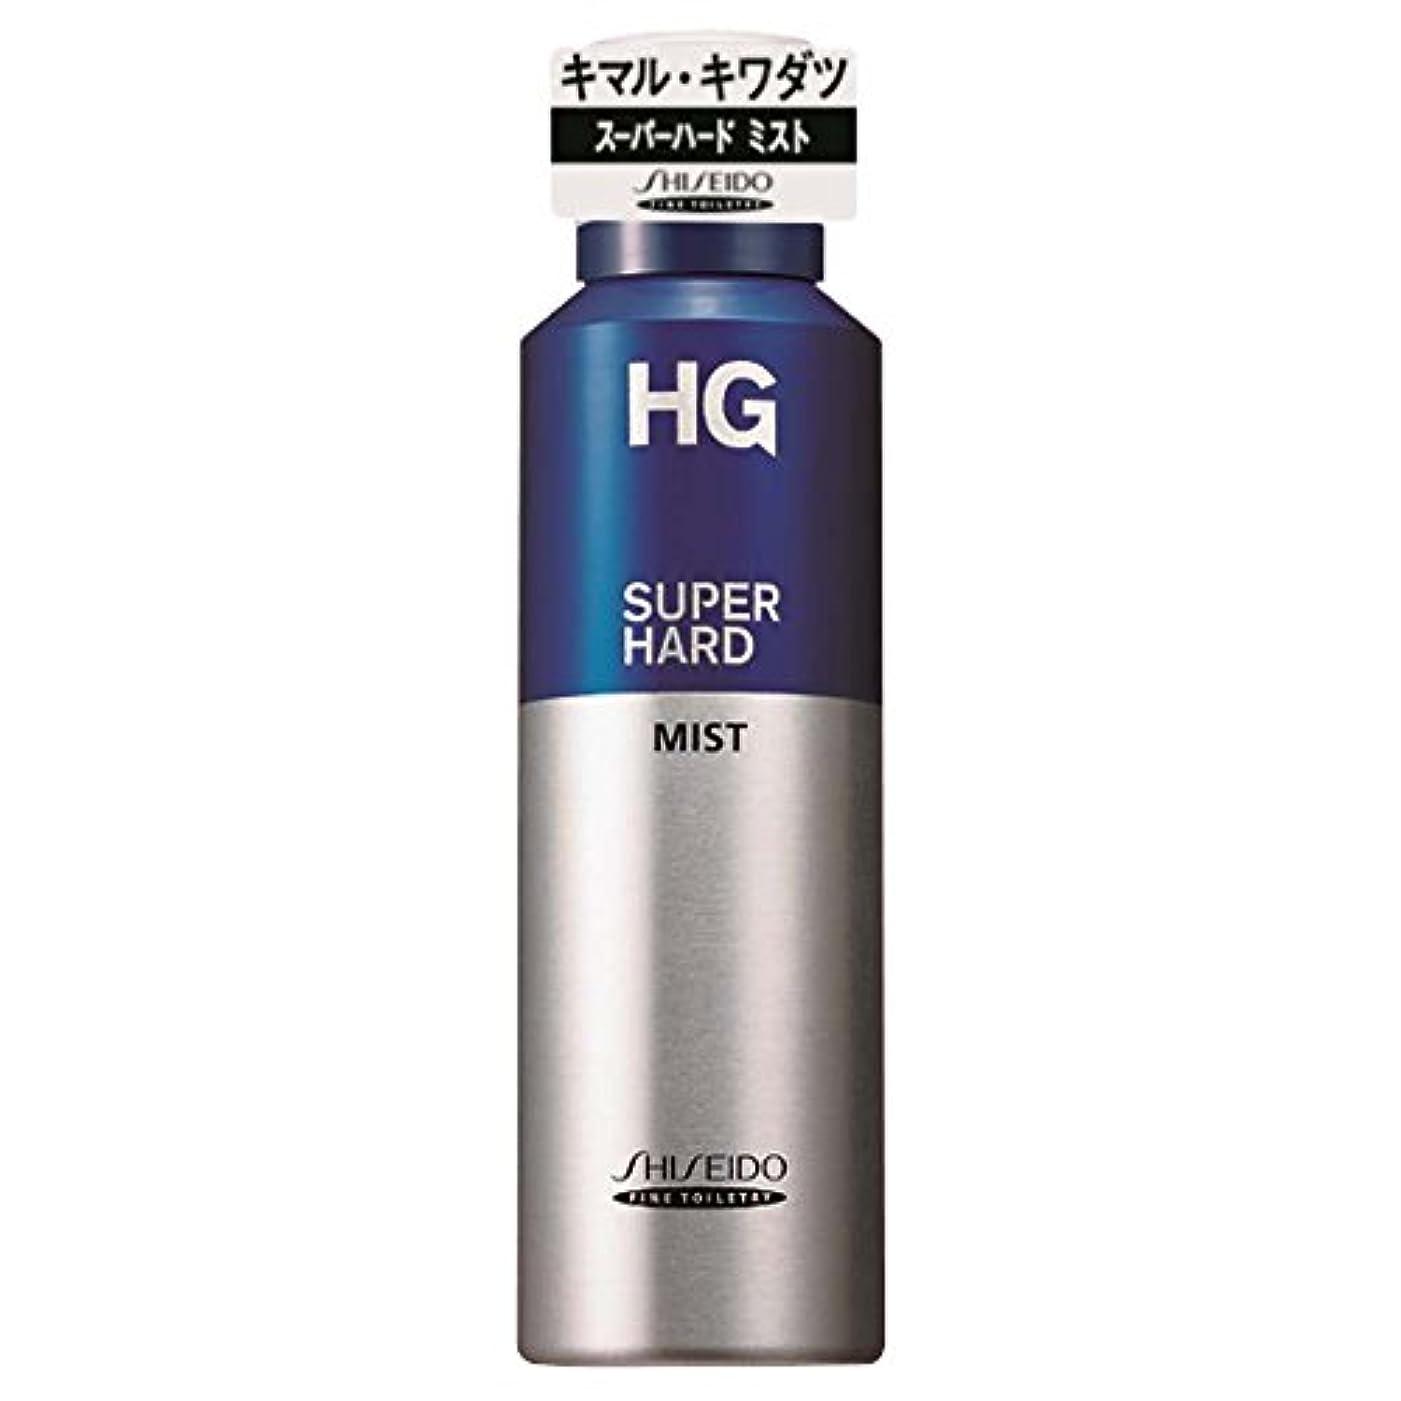 HG スーパーハードミストa 【HTRC3】